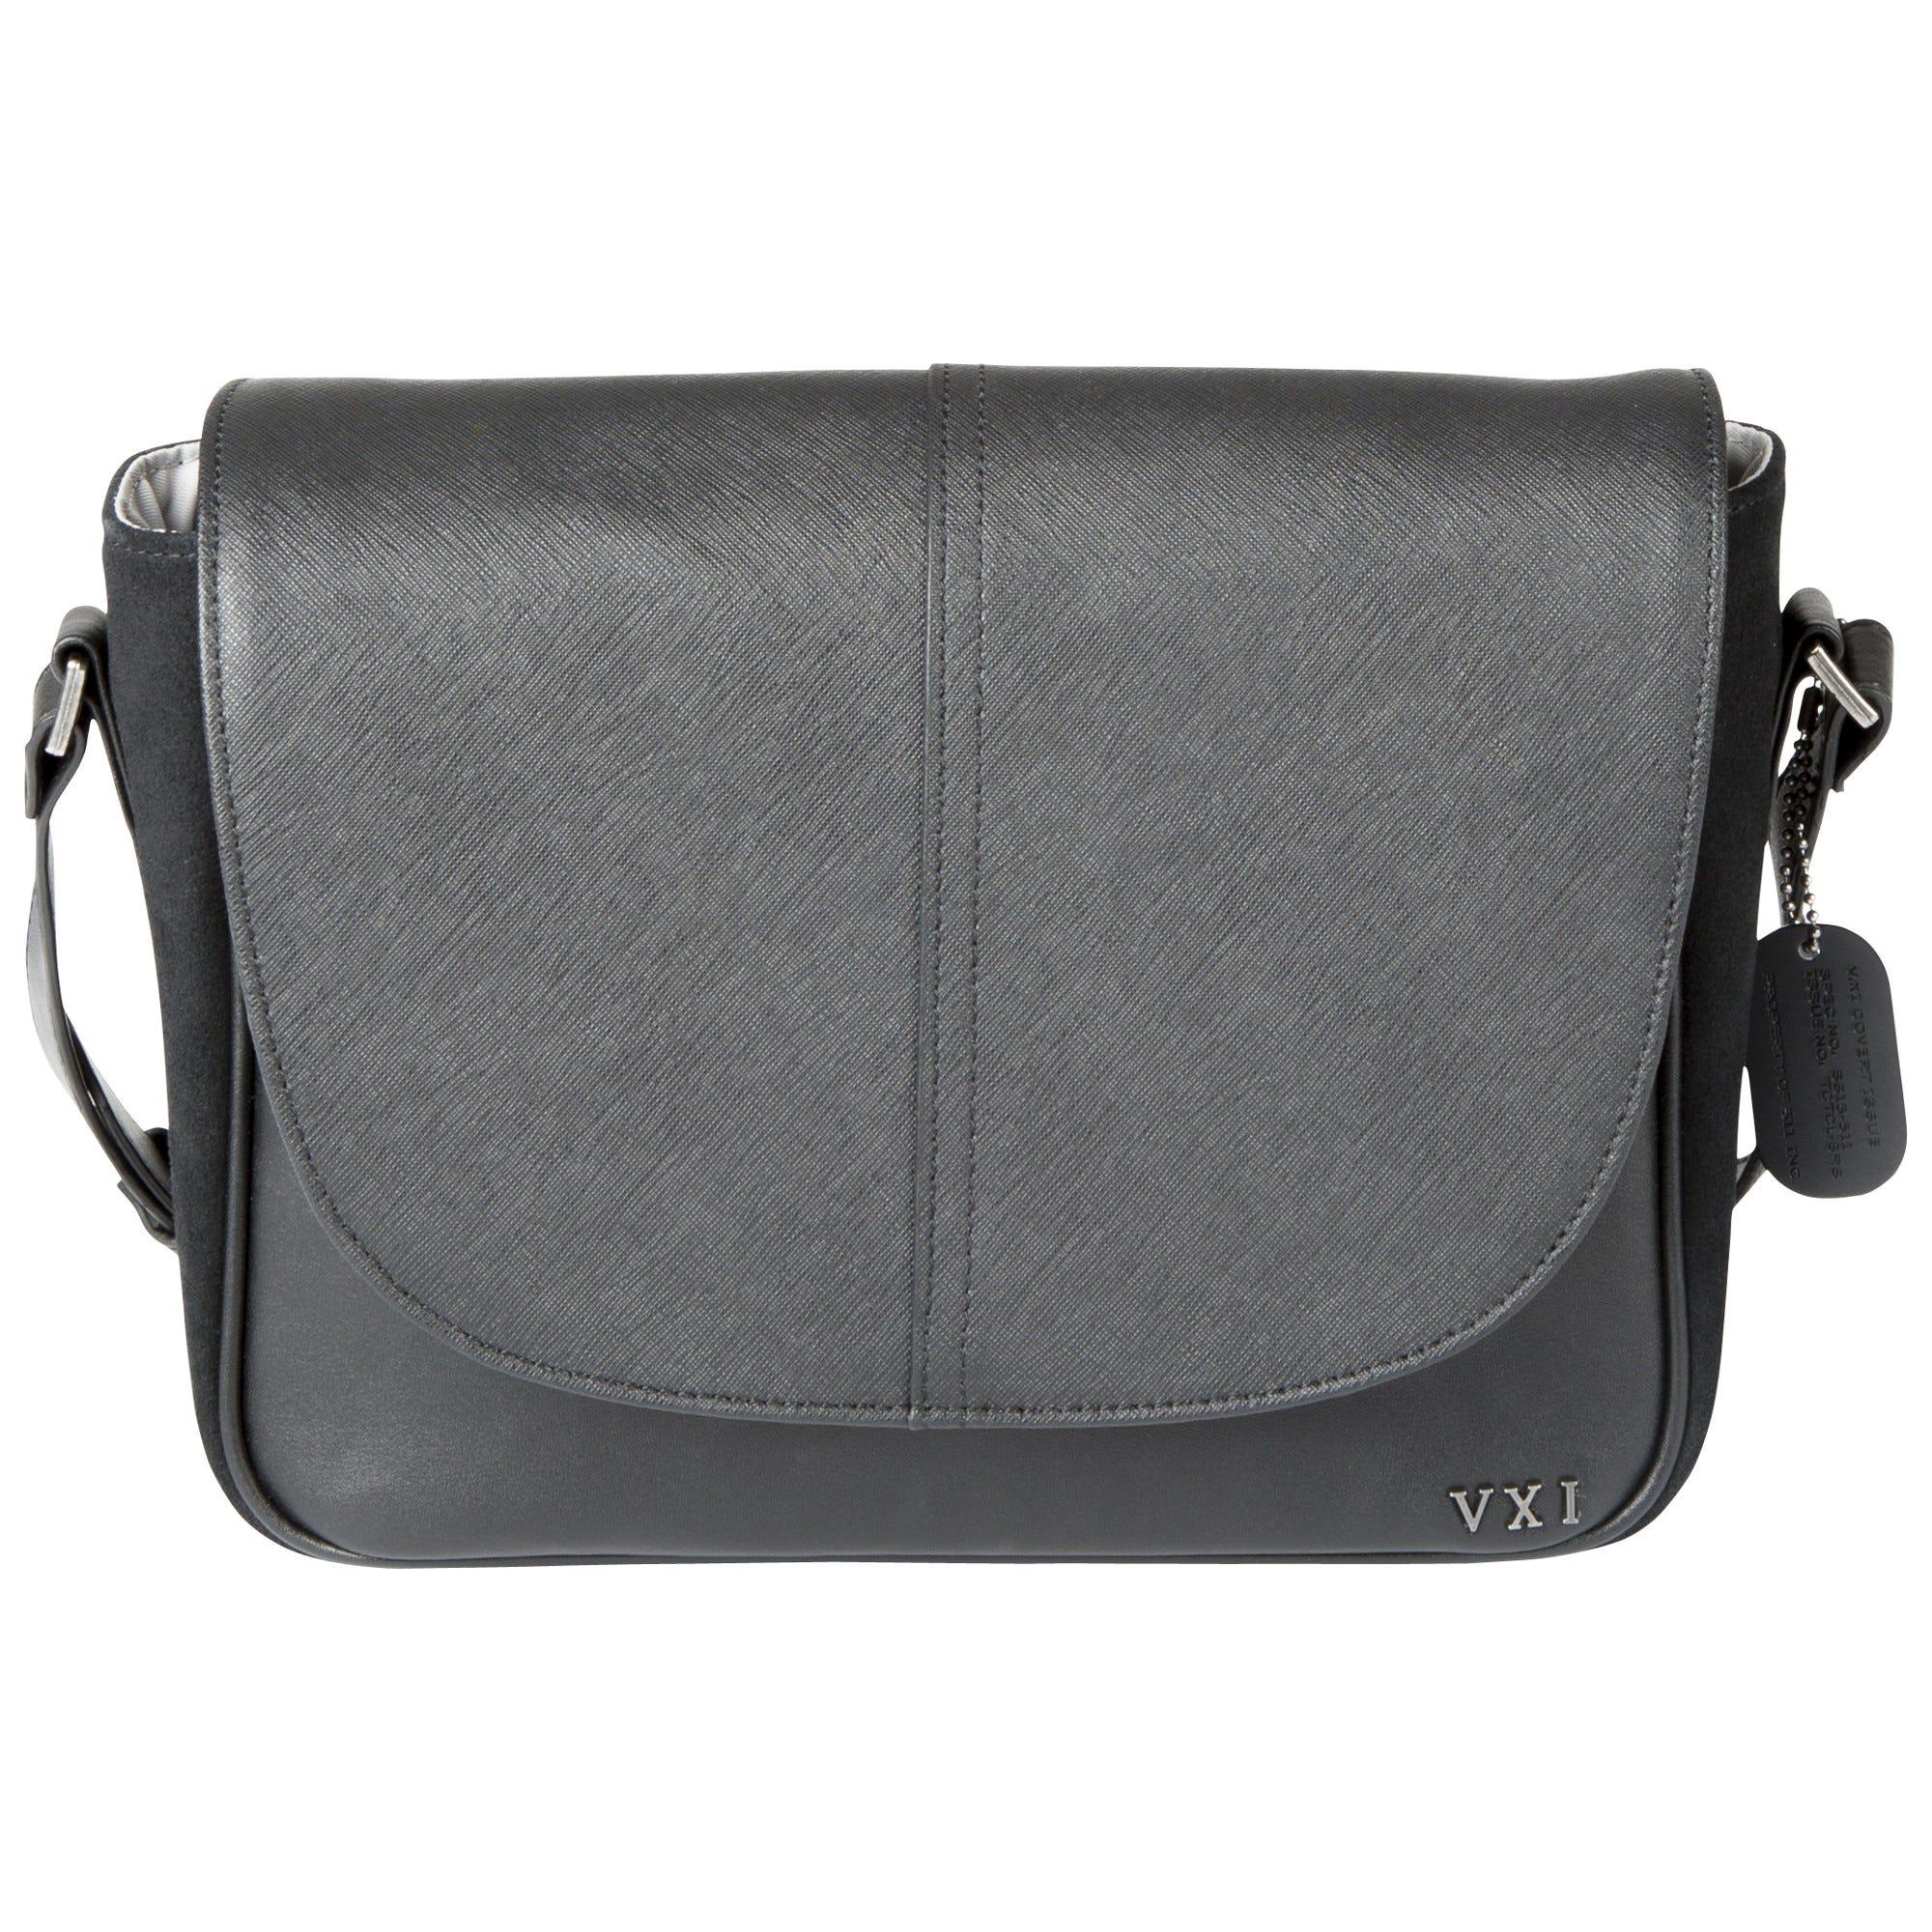 5.11 Tactical Women's Charlotte Leather Crossbody Bag (Black)